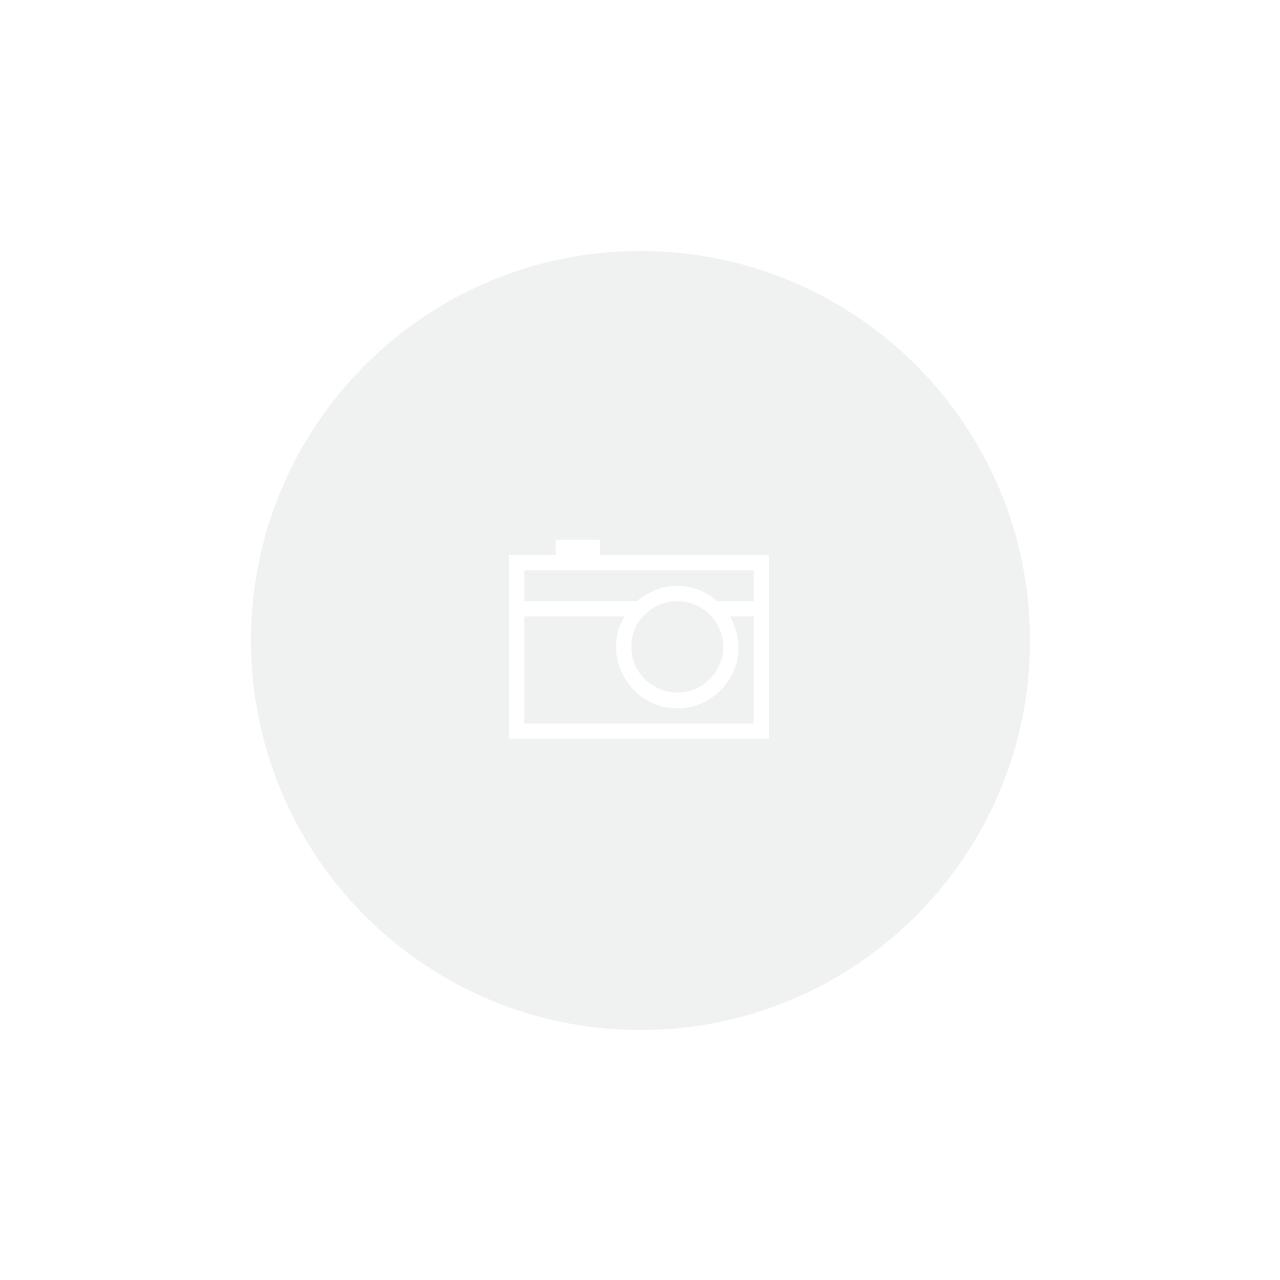 Impermeabilizante Asfáltico Preto 2x3,6 Litros